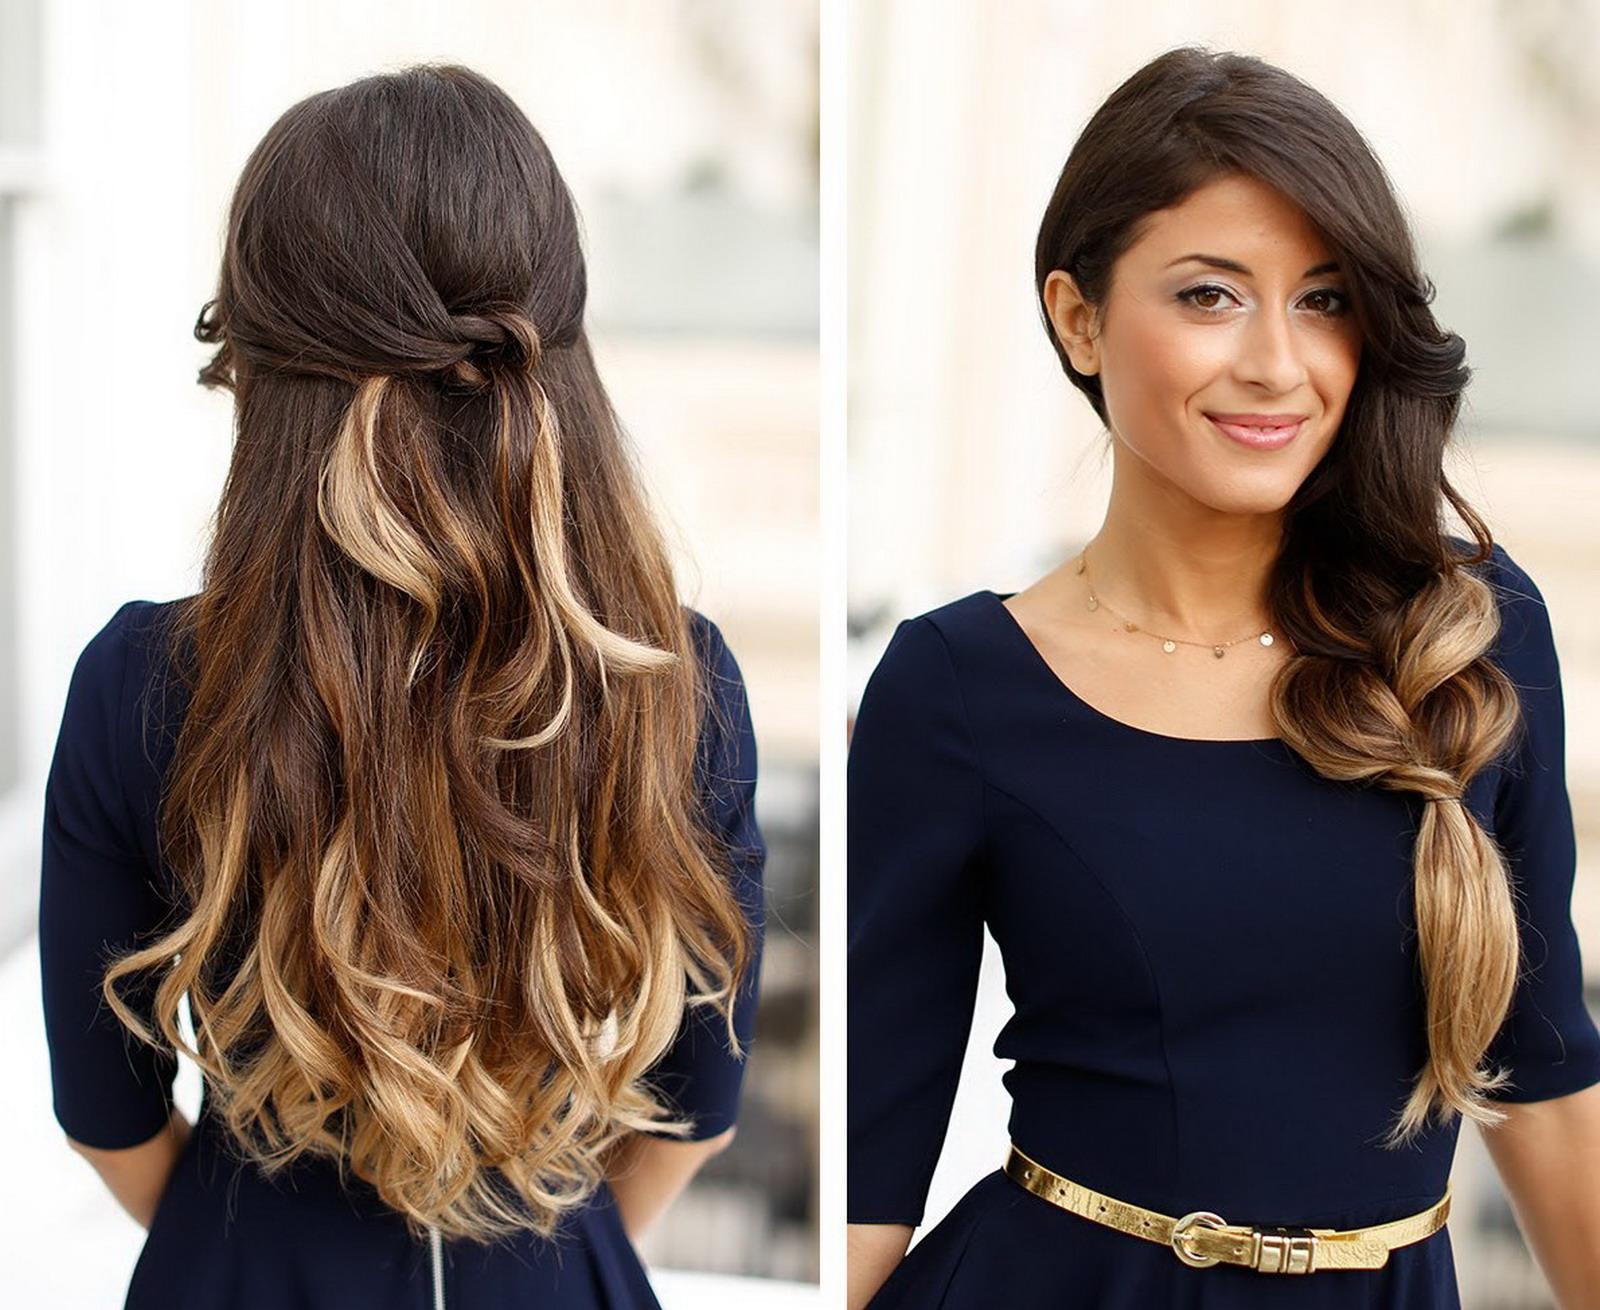 Marvelous Celebrity Hairstyles Long Hair Summer 2016 Hairstyles For Women Draintrainus